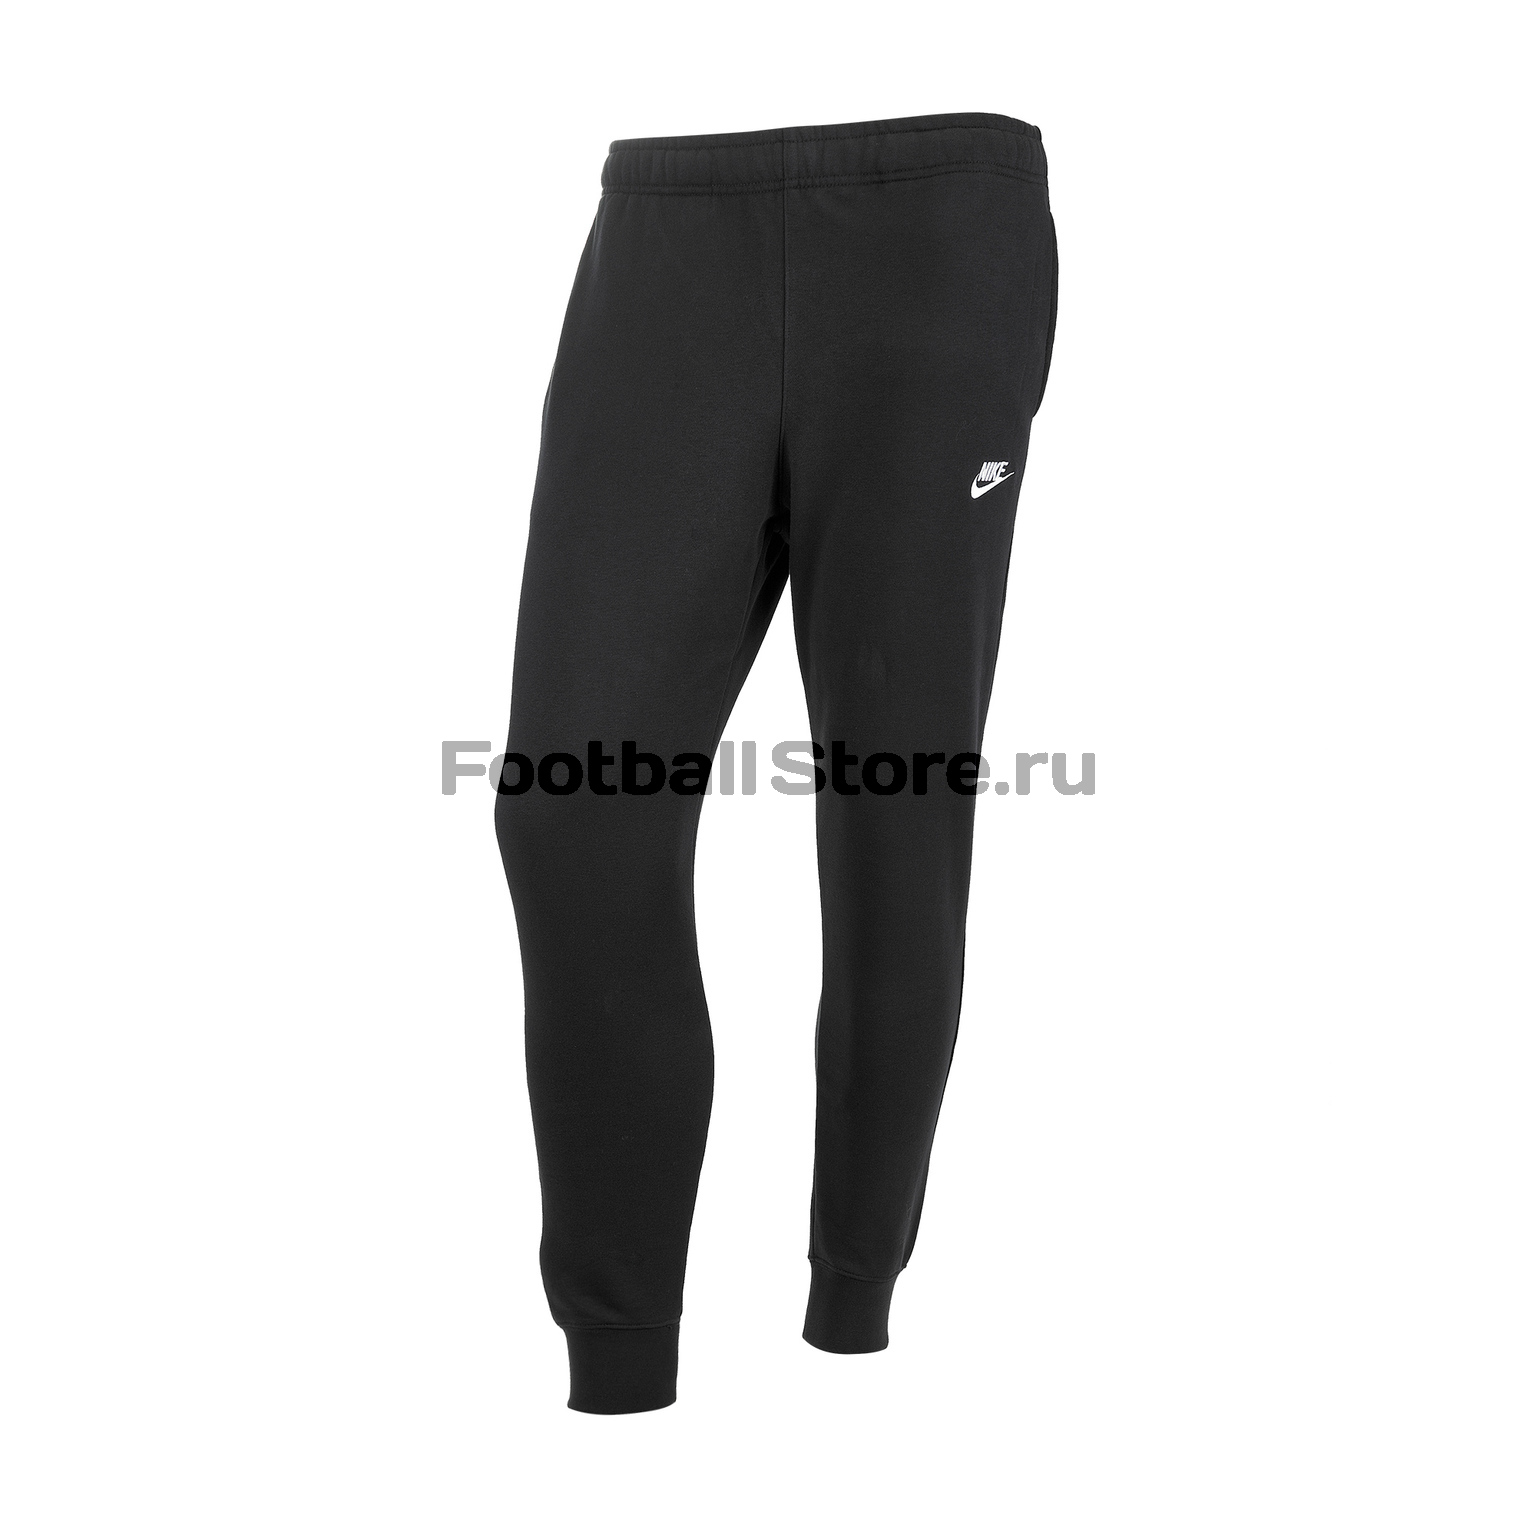 Брюки Nike Club Jogger BV2679-010 цена в Москве и Питере